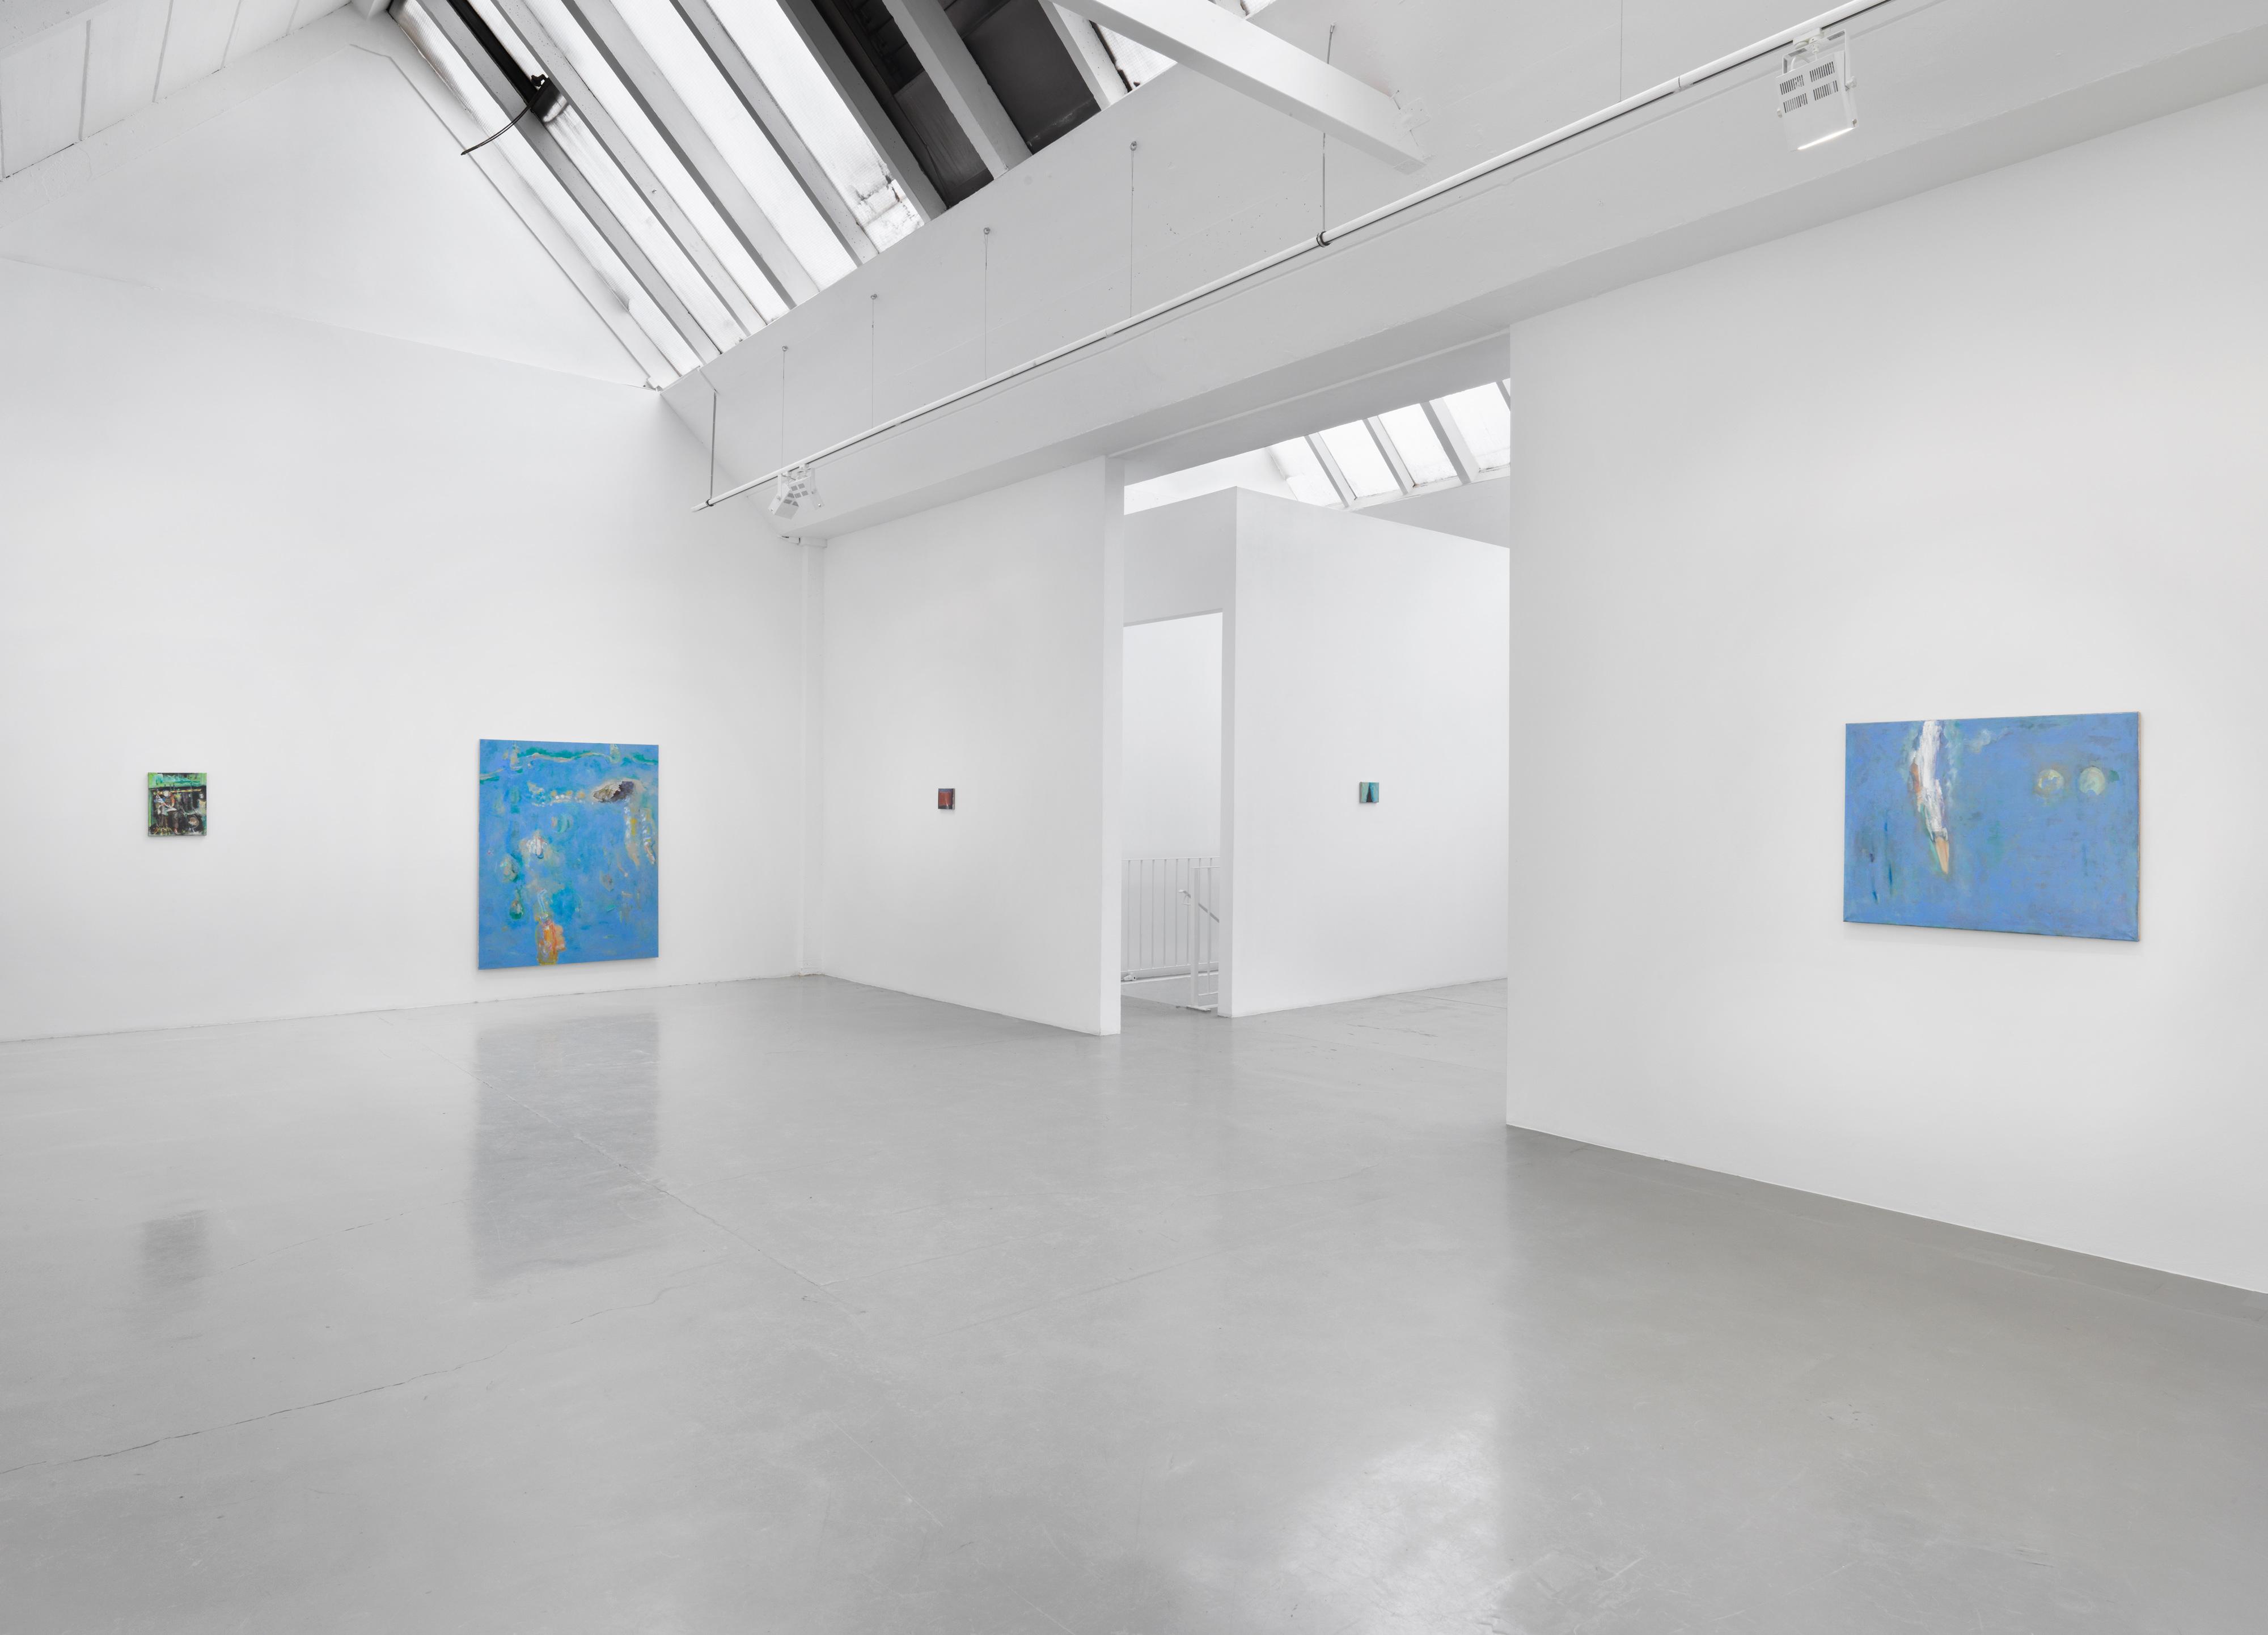 Galerie Barbara Thumm \ Valérie Favre – Tier ohne Brille